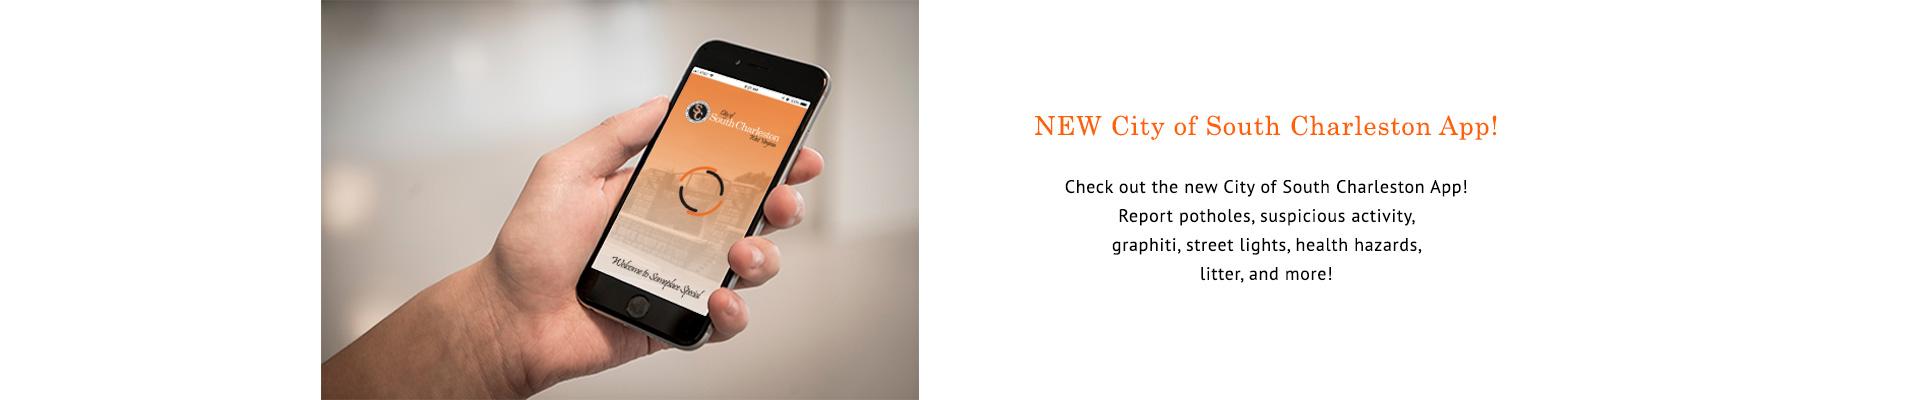 City of South Charleston Mobile App